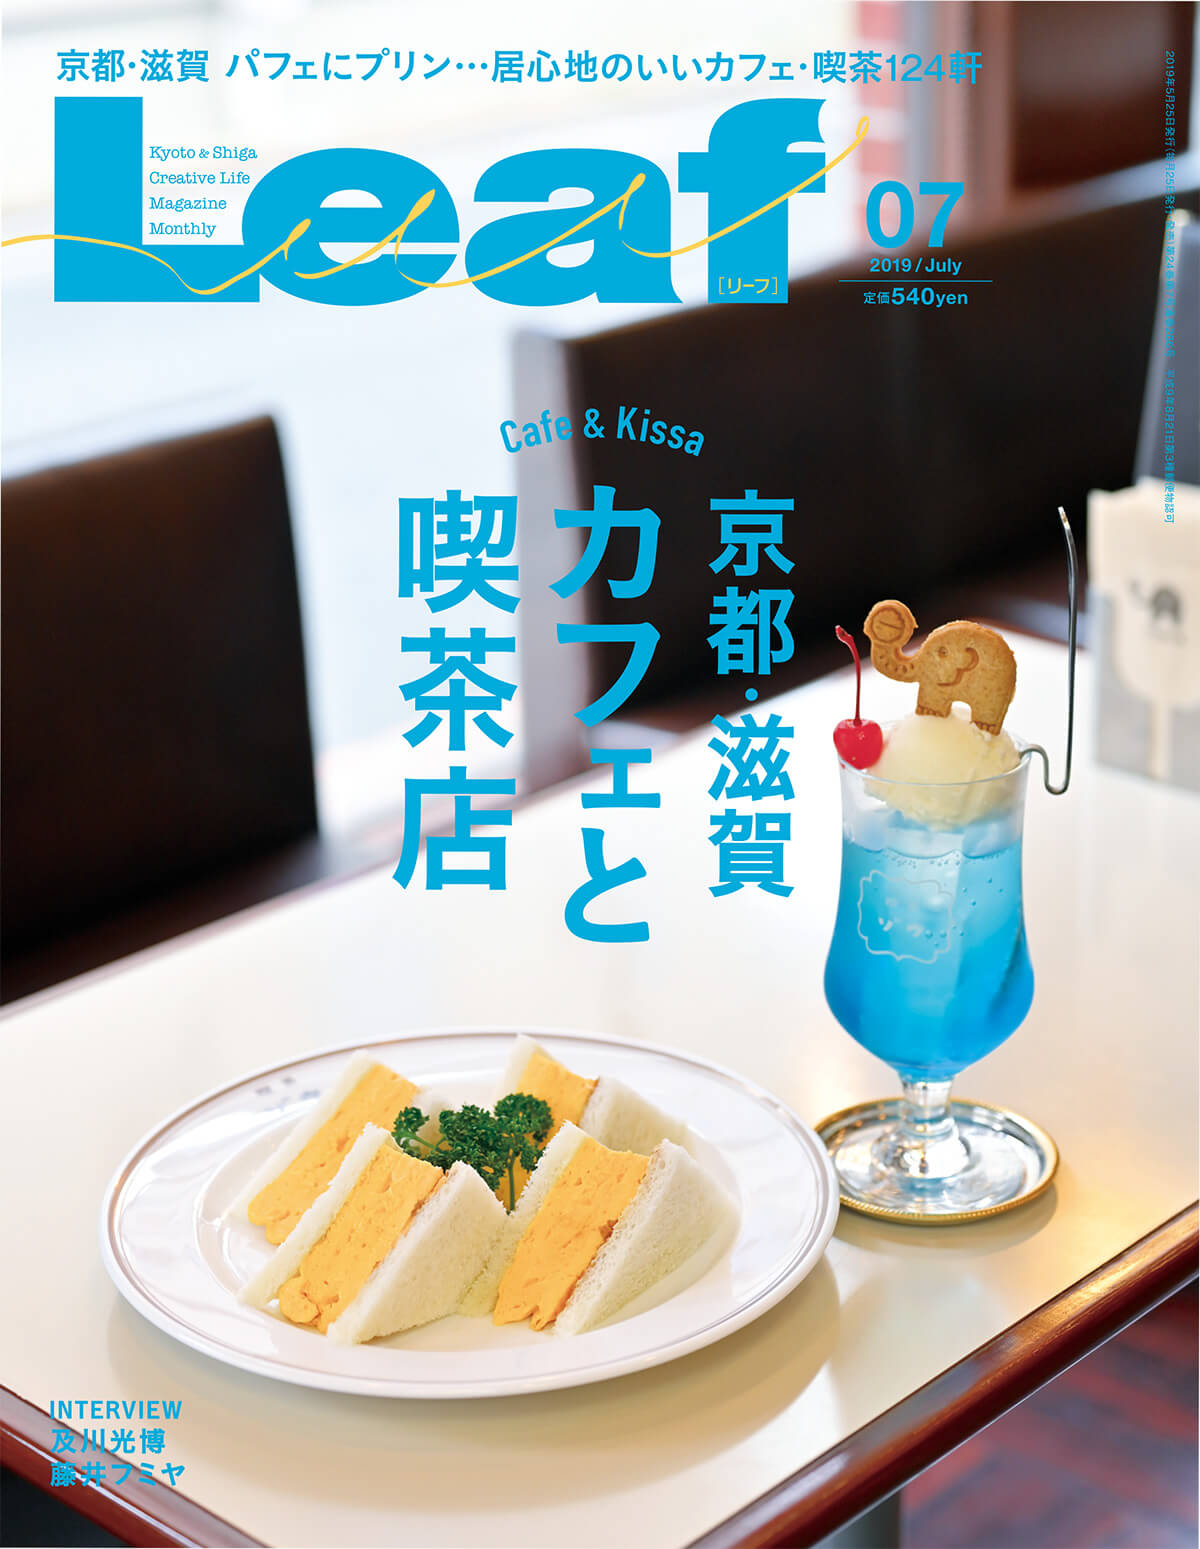 Leaf - 京都・滋賀 カフェと喫茶